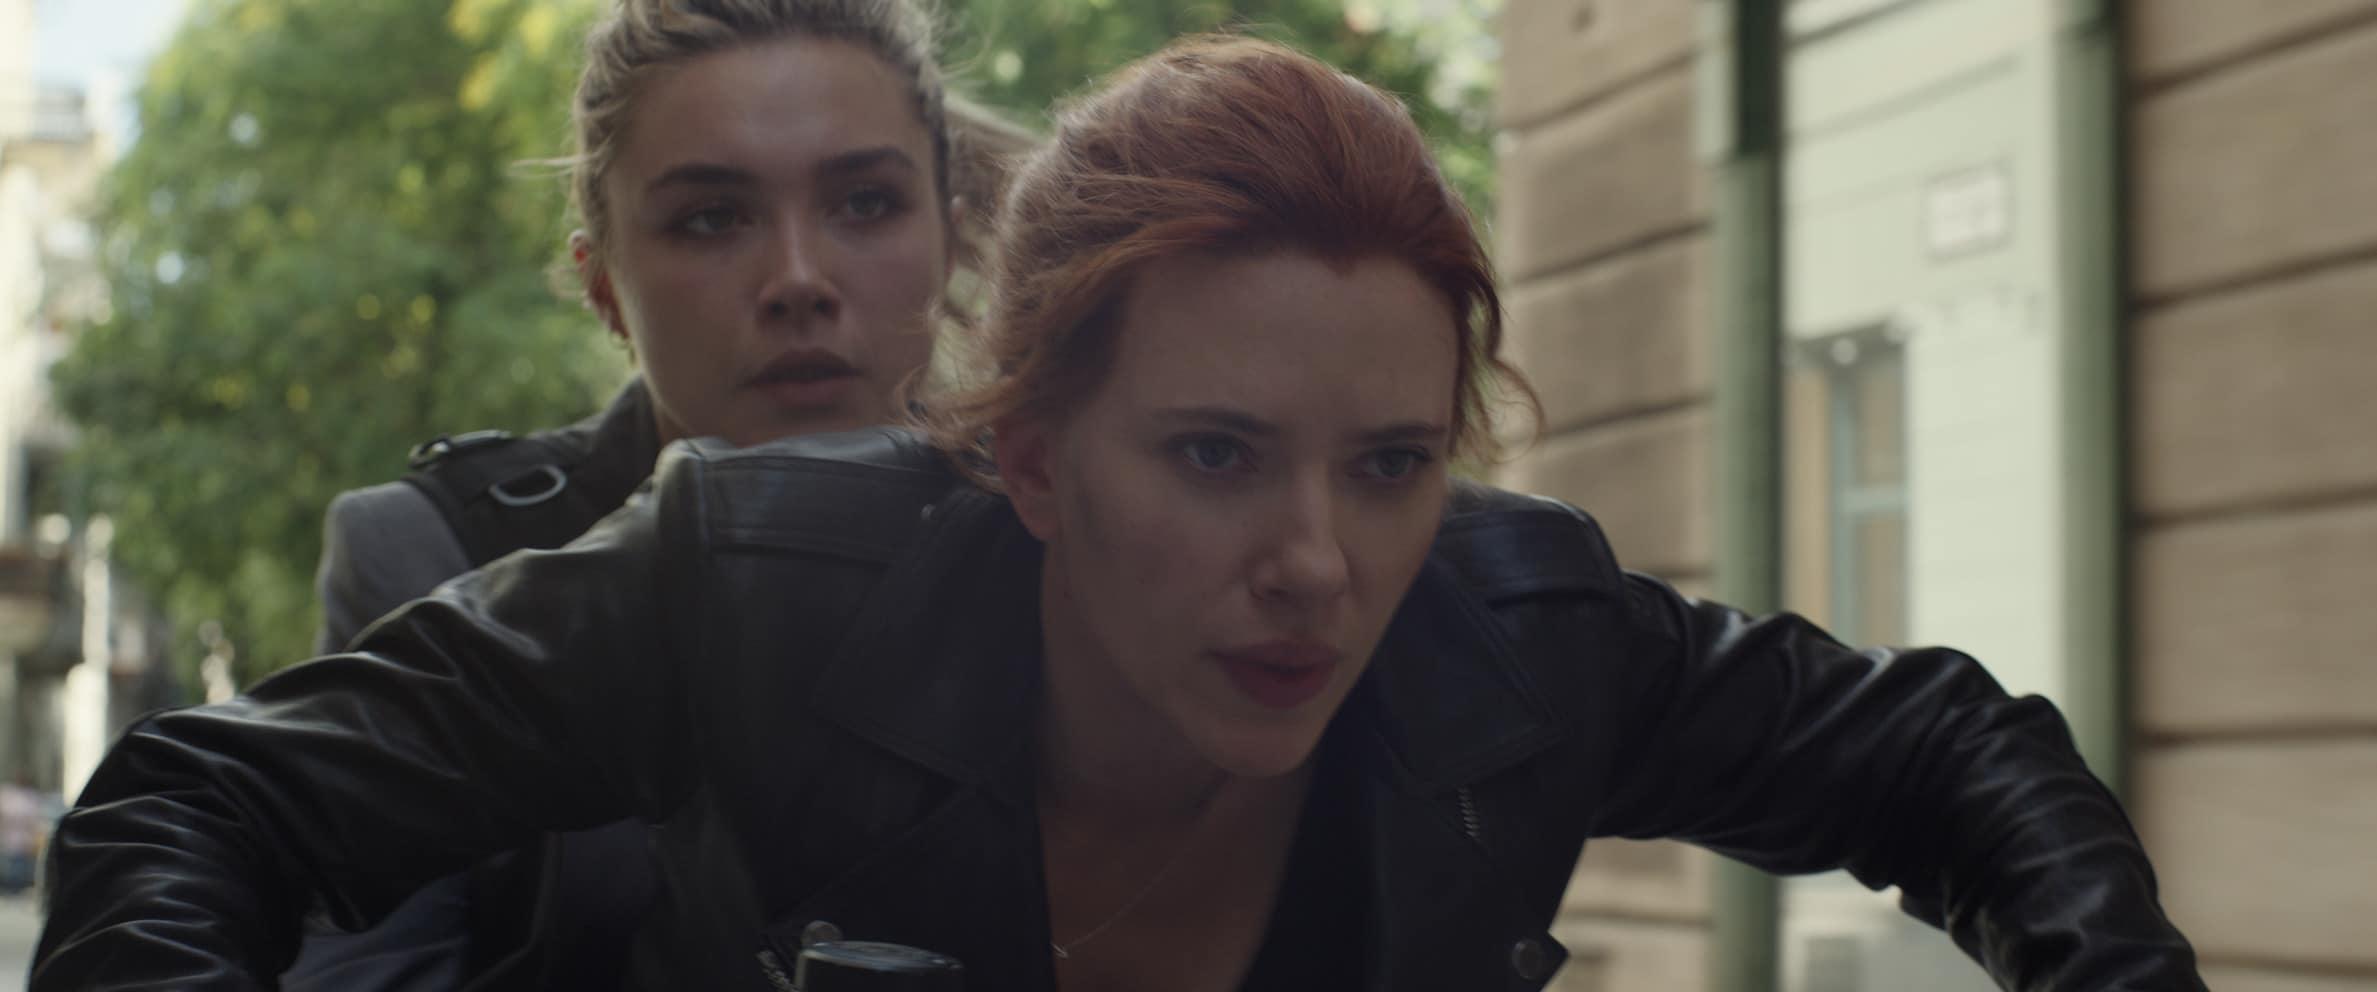 Black Widow: Scarlett Johansson e Florence Pugh